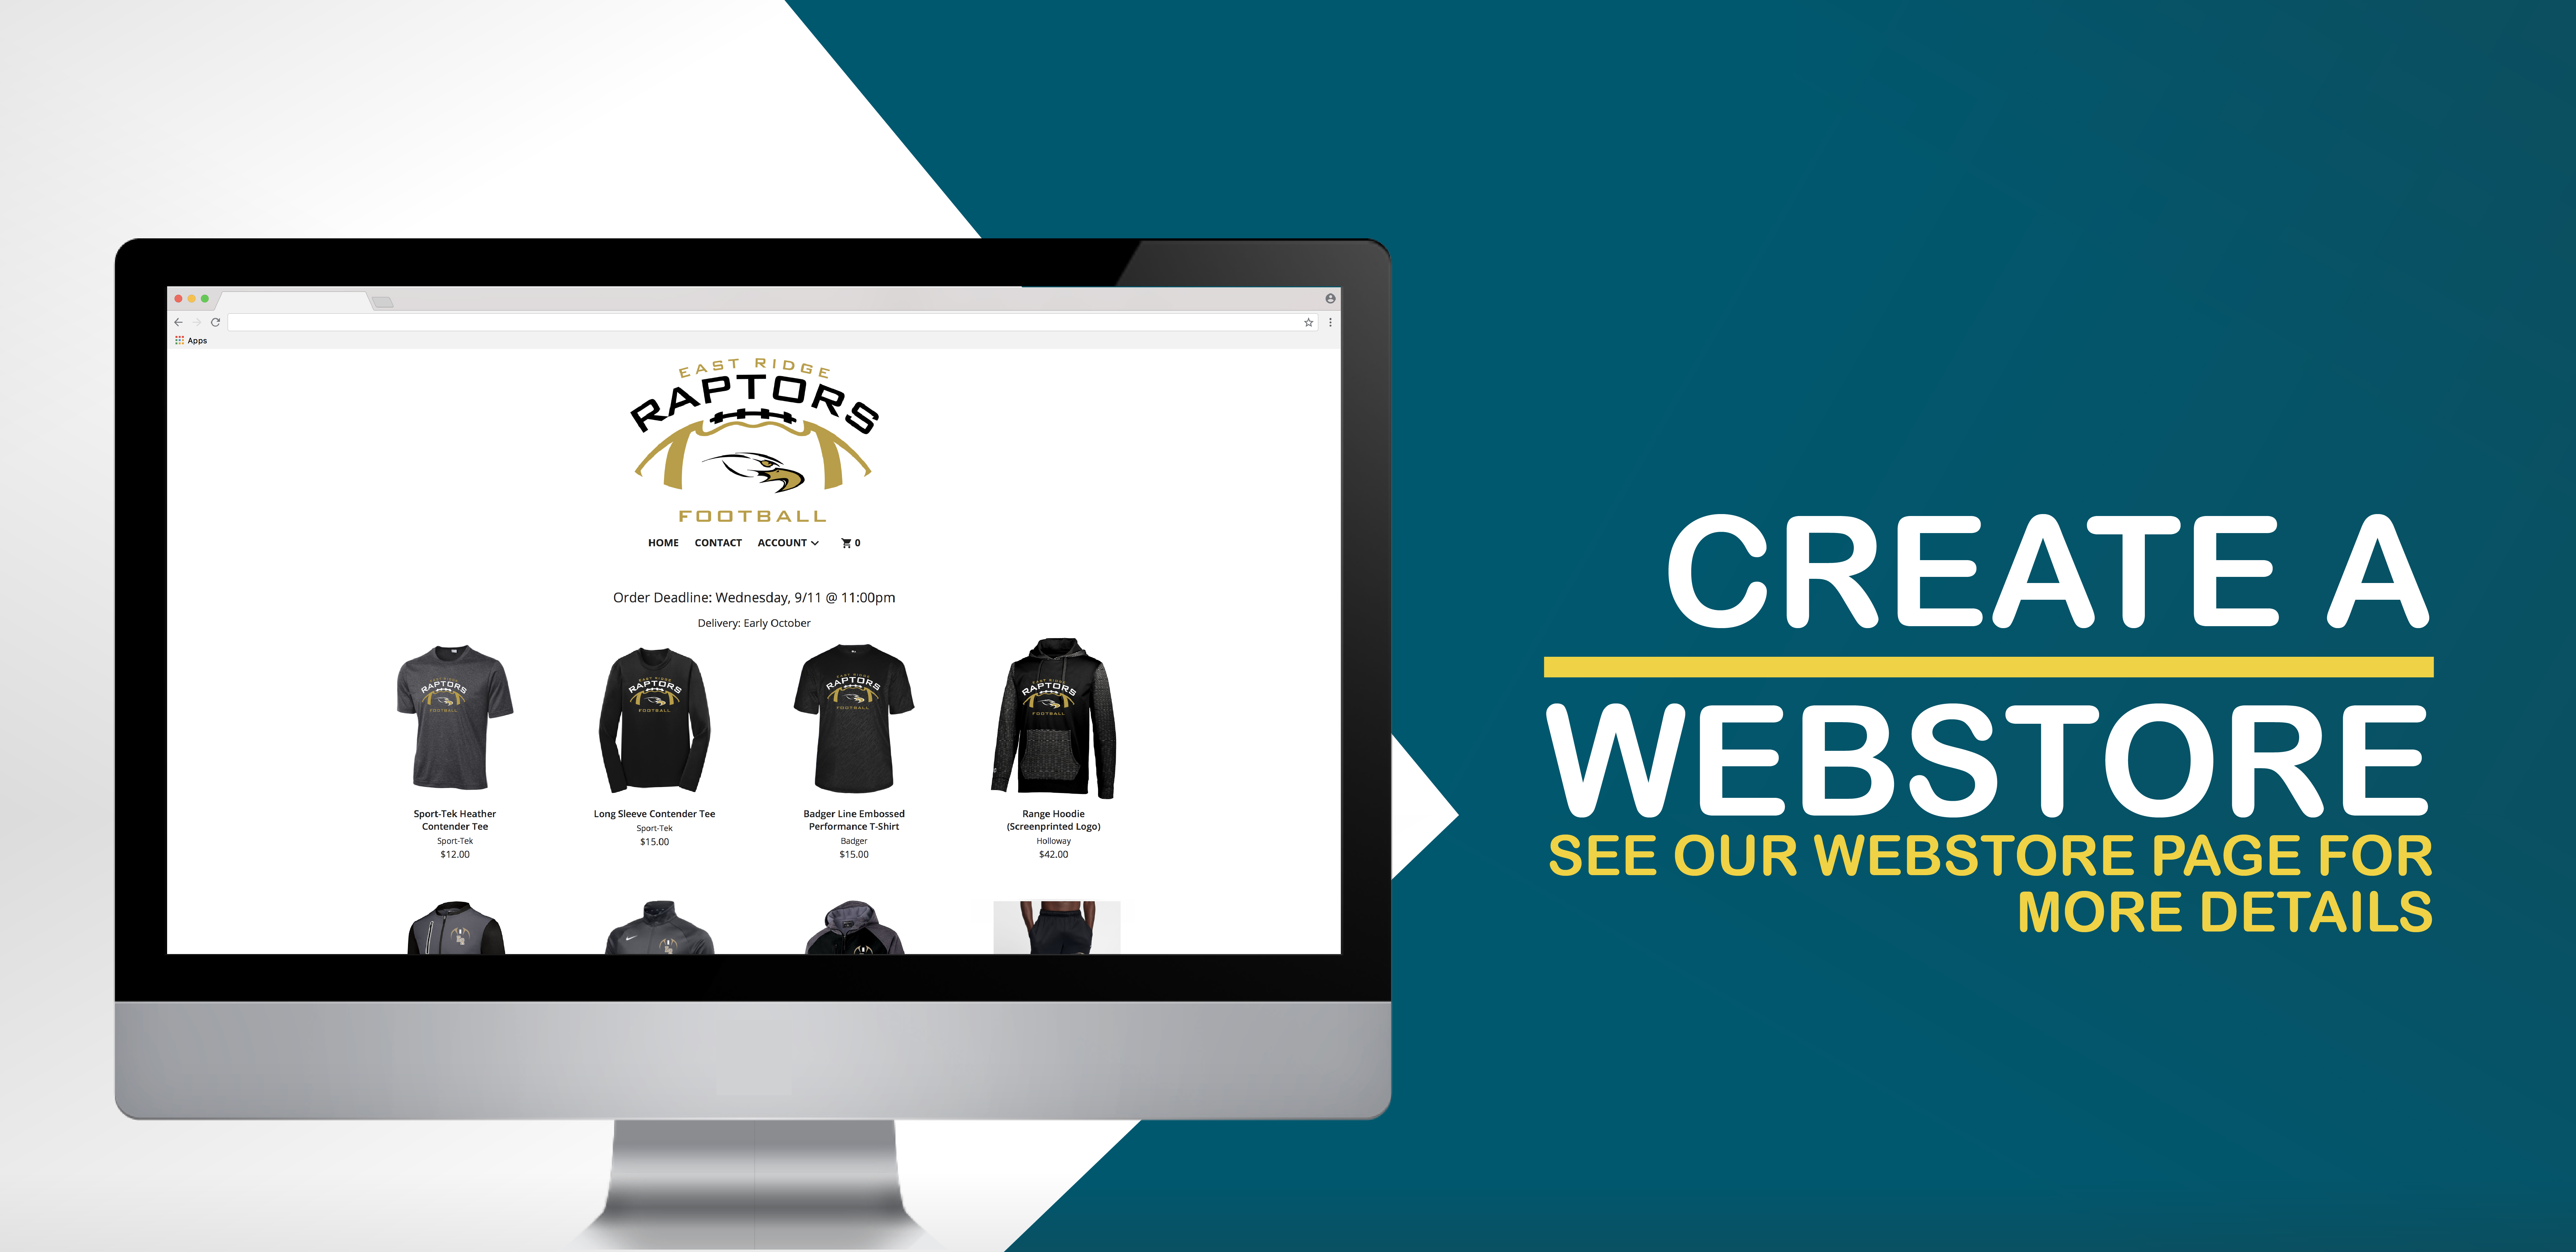 Create Webstore Image-01